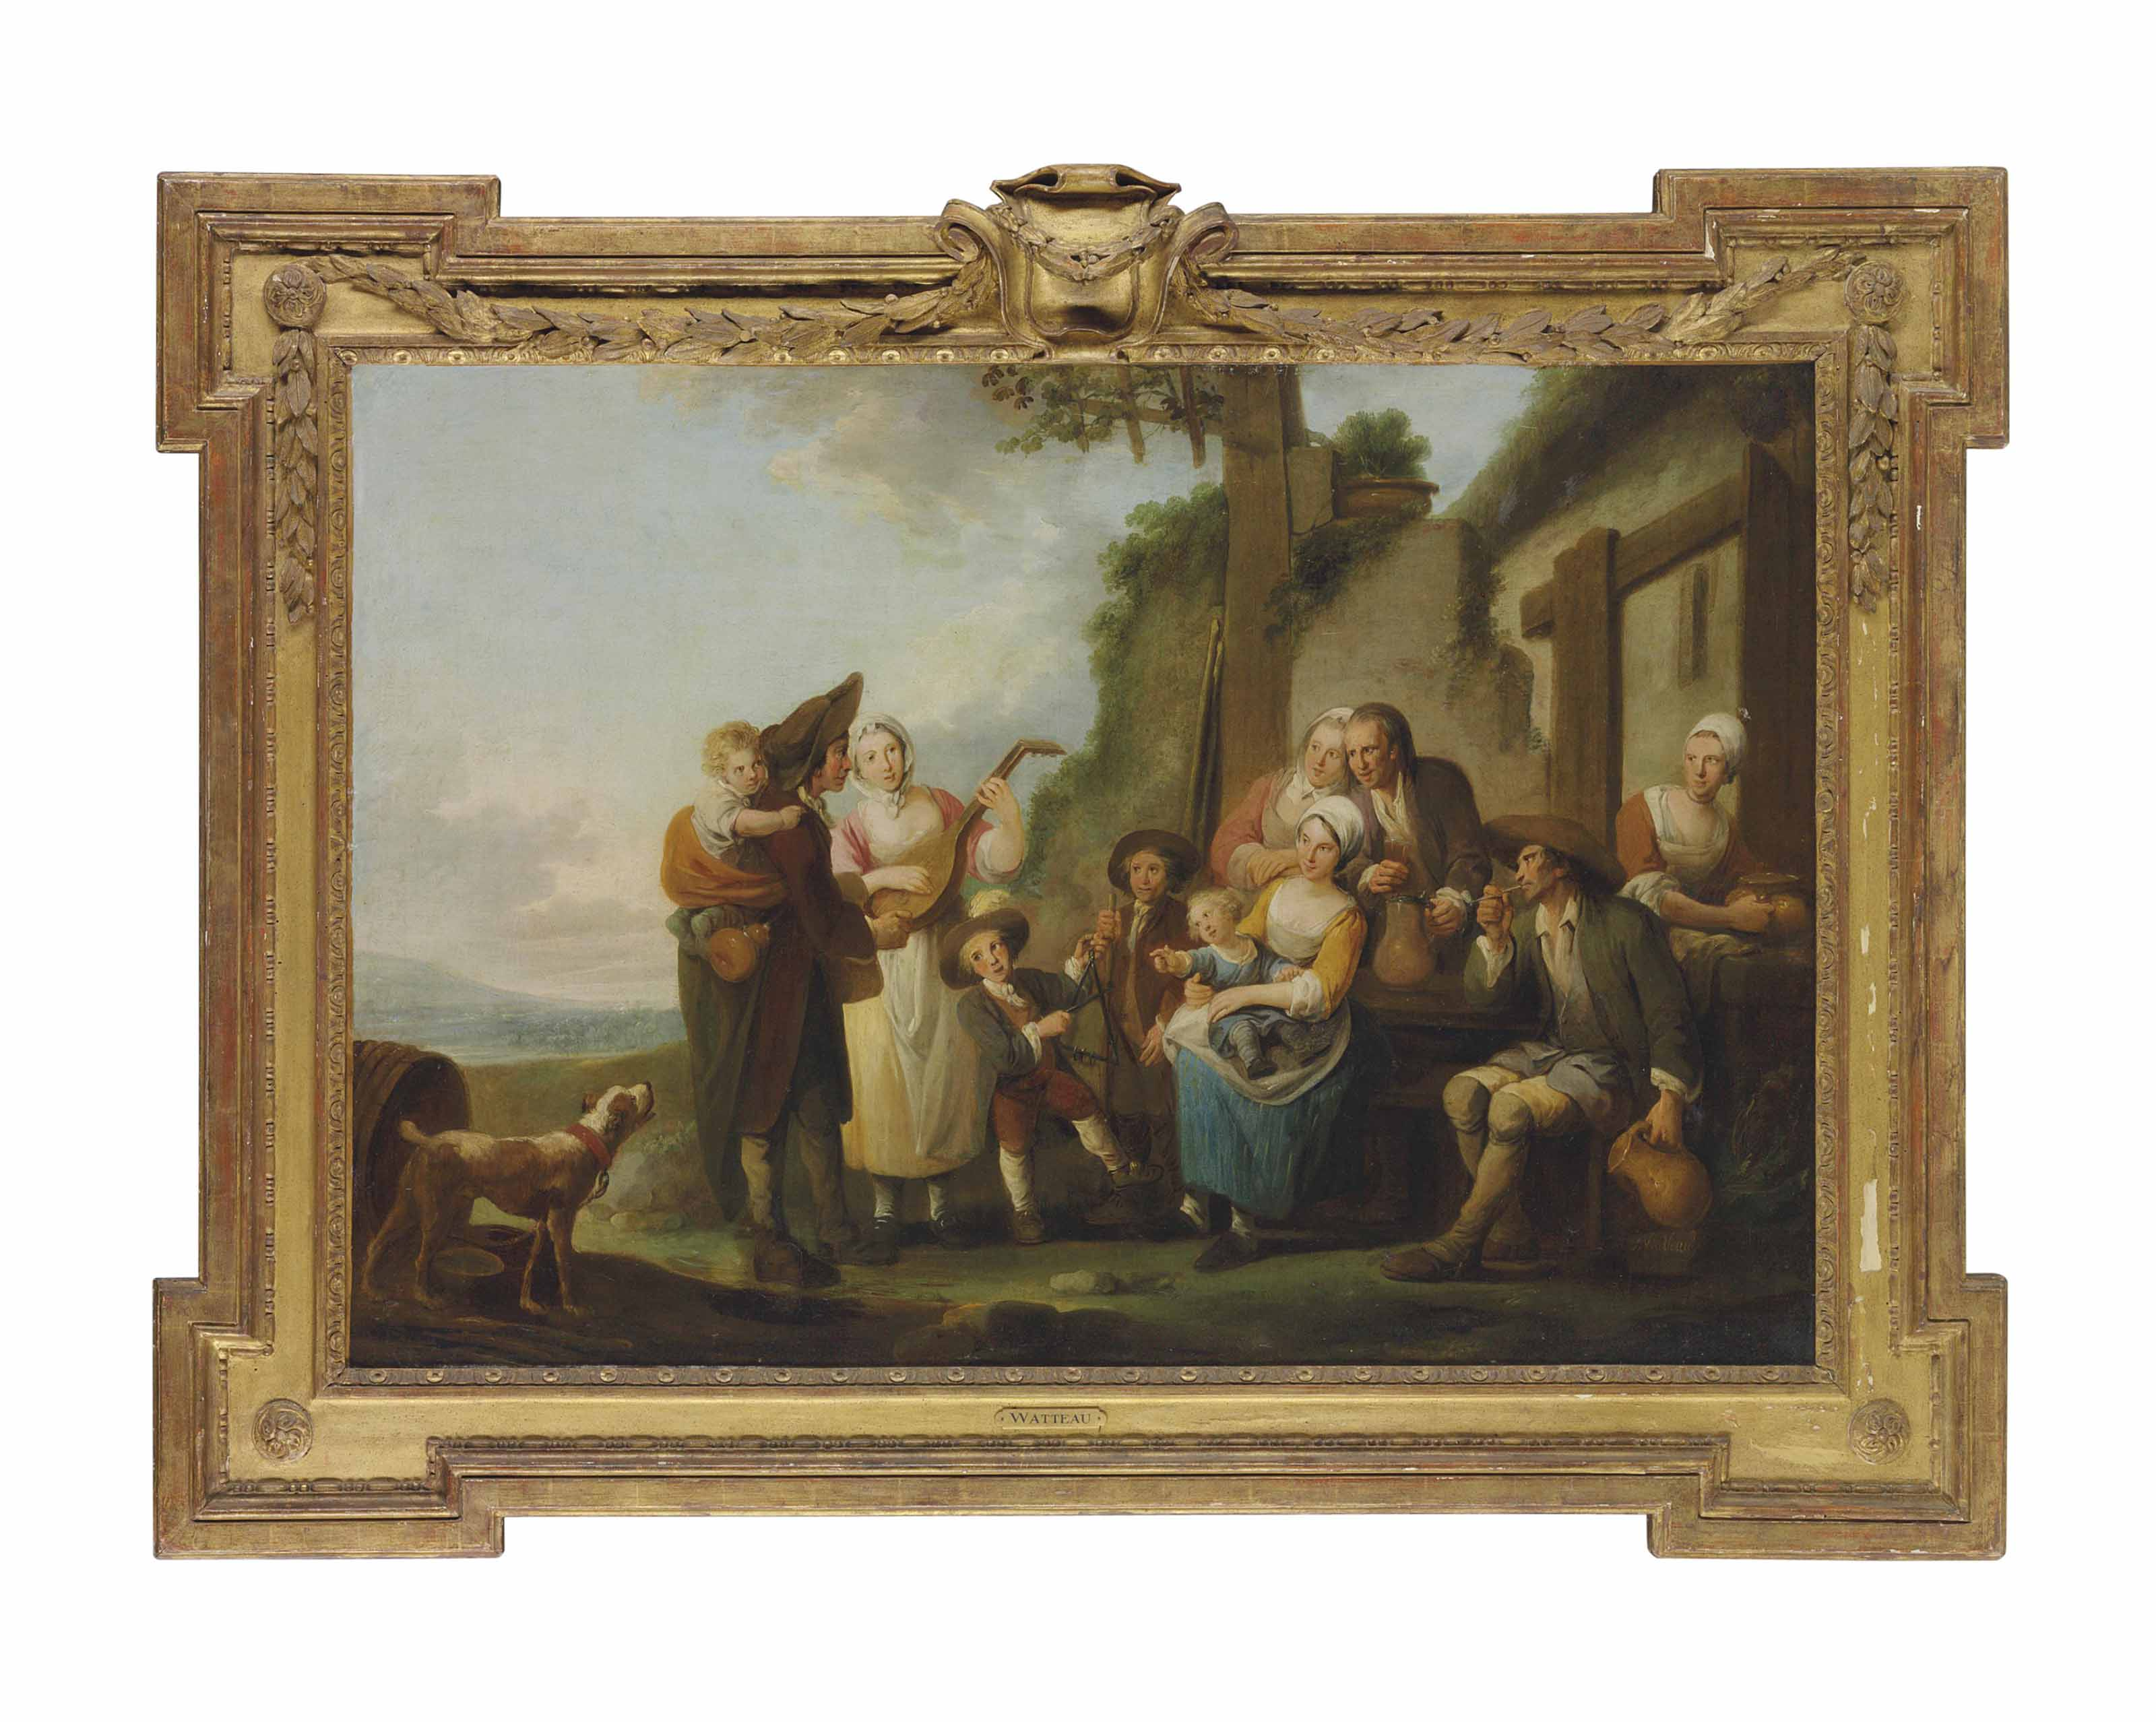 Peasants merry-making outside an inn in a landscape